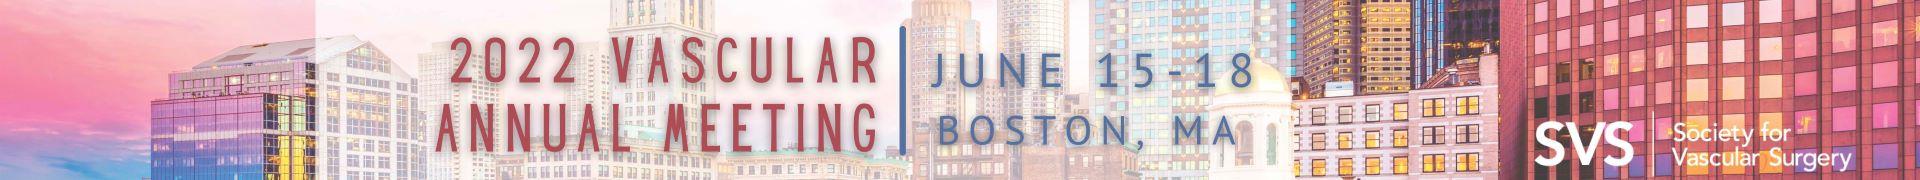 2022 Vascular Annual Meeting Event Banner